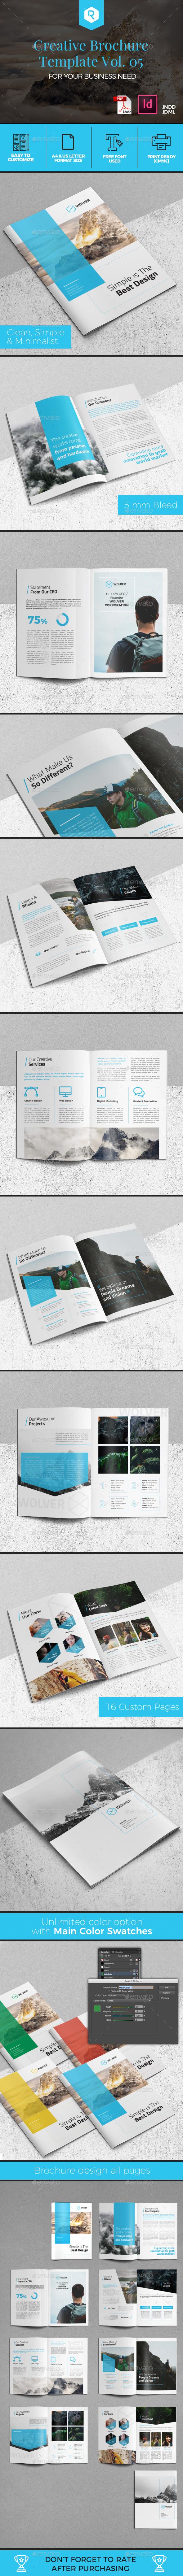 Creative Brochure Template Vol. 05 - Corporate Brochures